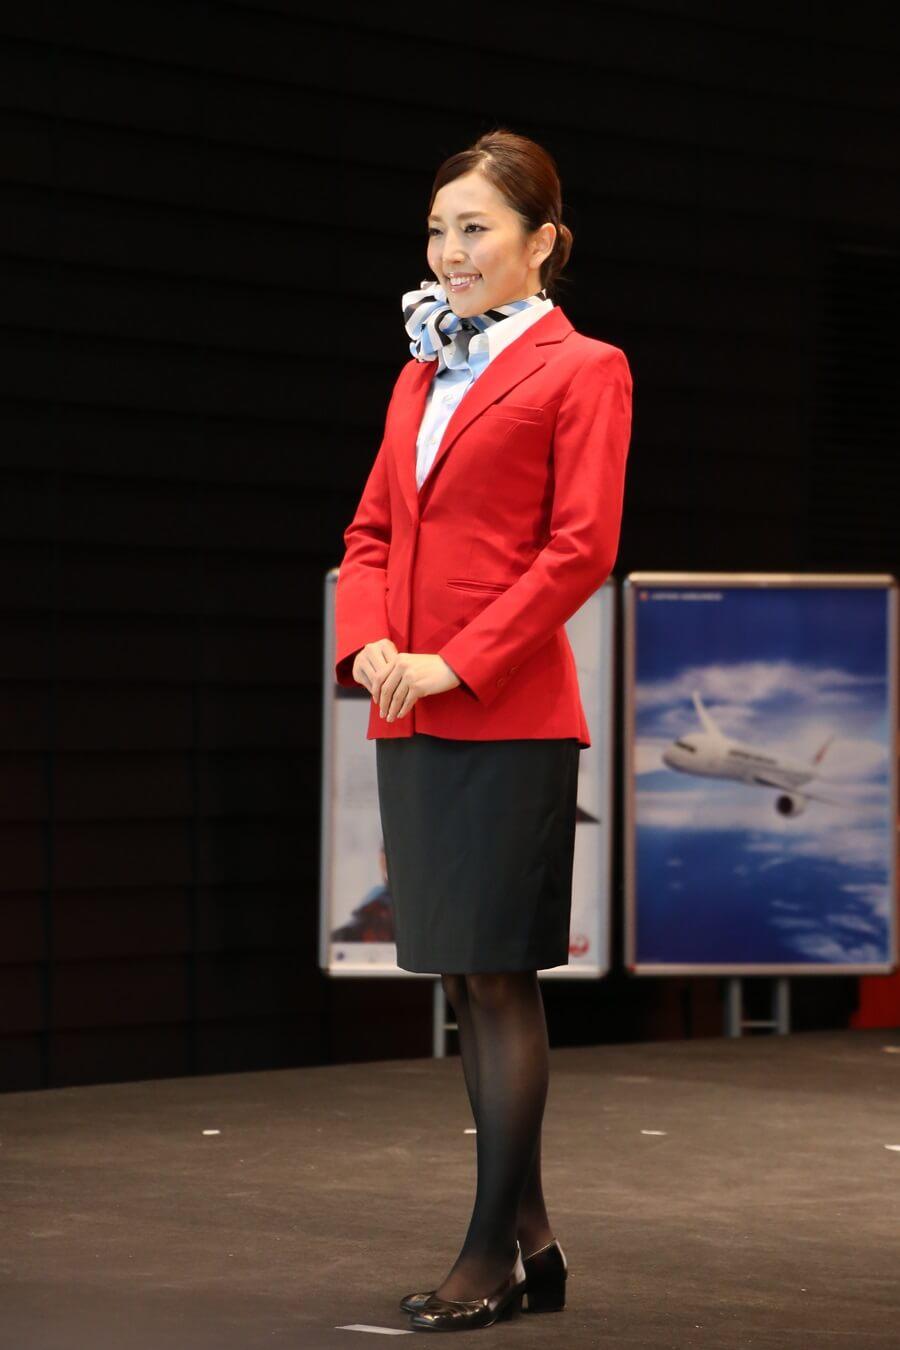 JEX2代目制服 JALとJEX客室乗務員歴代制服ファッションショー 客室乗務員 スチワーデス 歴代ユニフォーム 制服 空の日フェスティバル JAL fashion show JAL Express JEX (2)